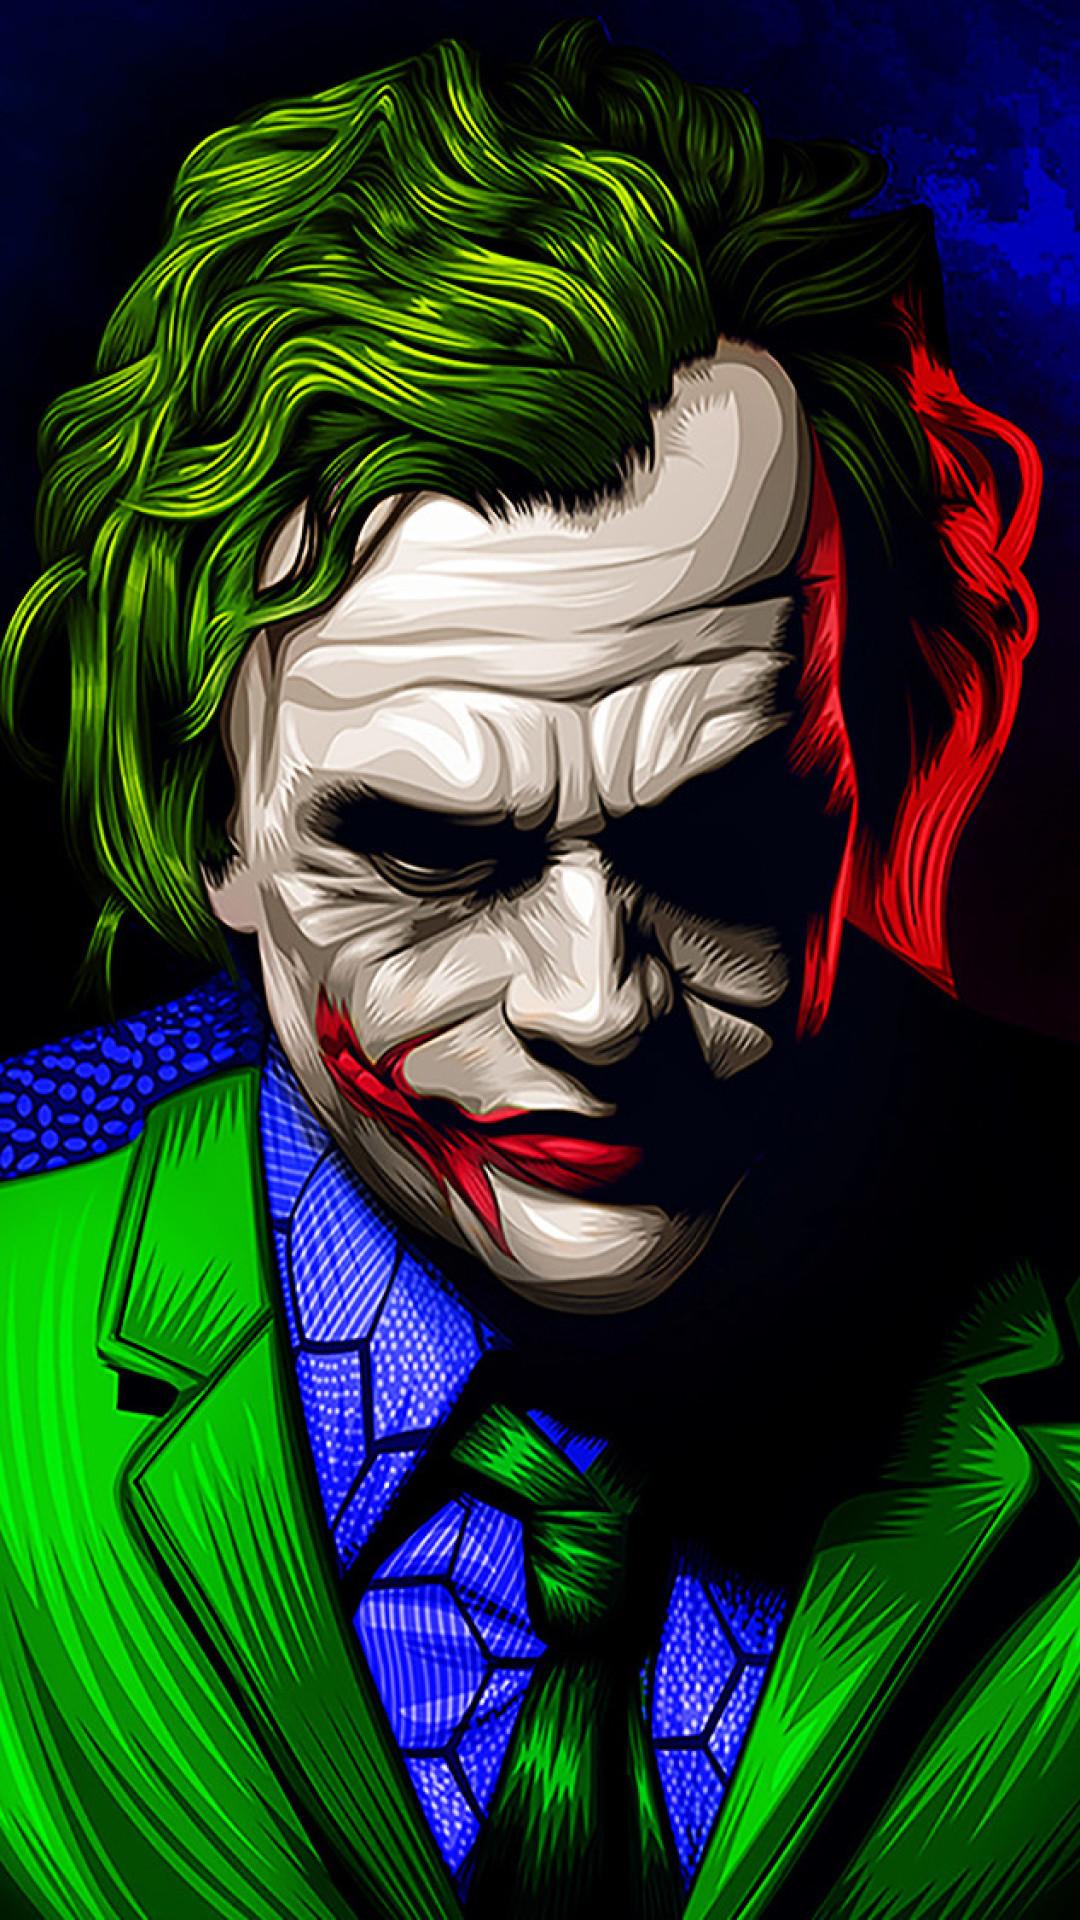 Top 250 Joker Wallpapers 4k Hd Join us in the forum. getty wallpapers